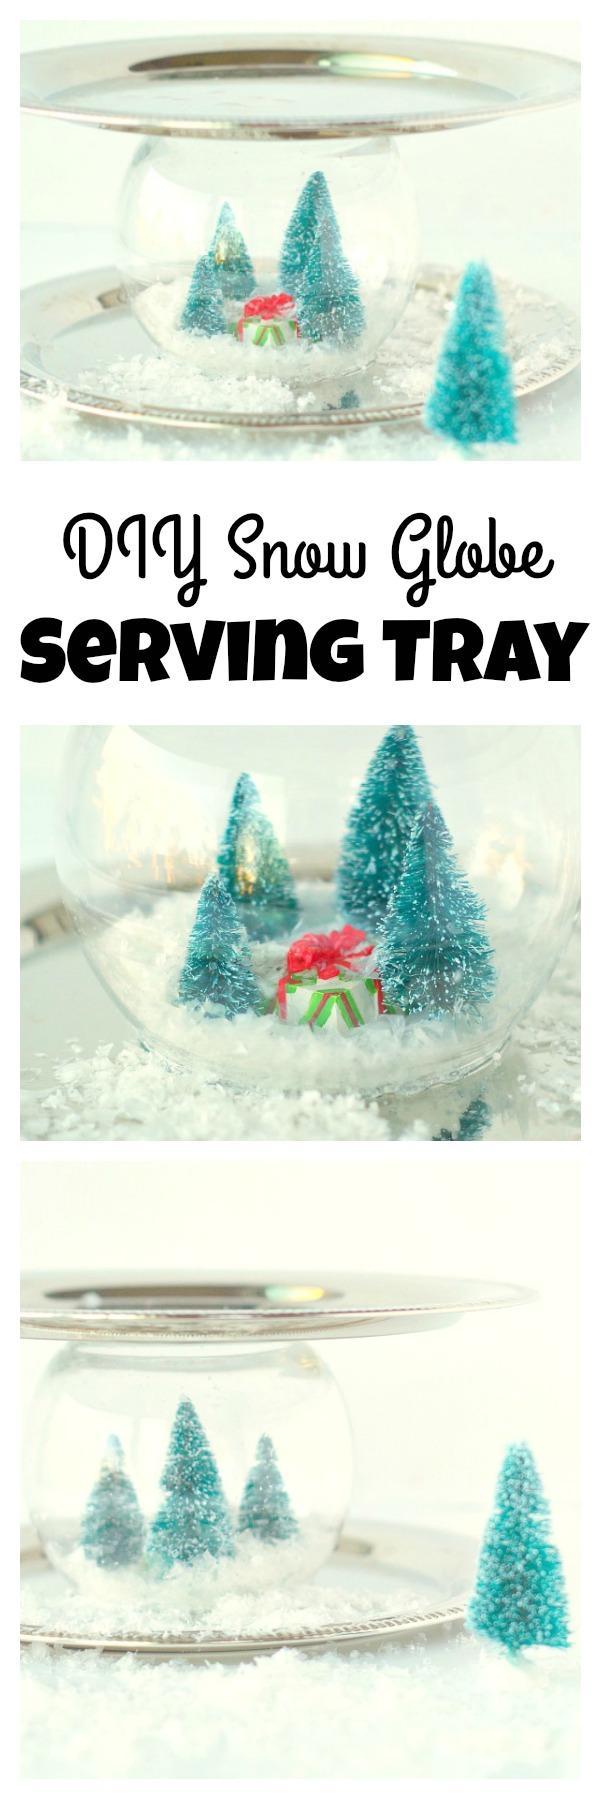 DIY Snow Globe Serving Tray